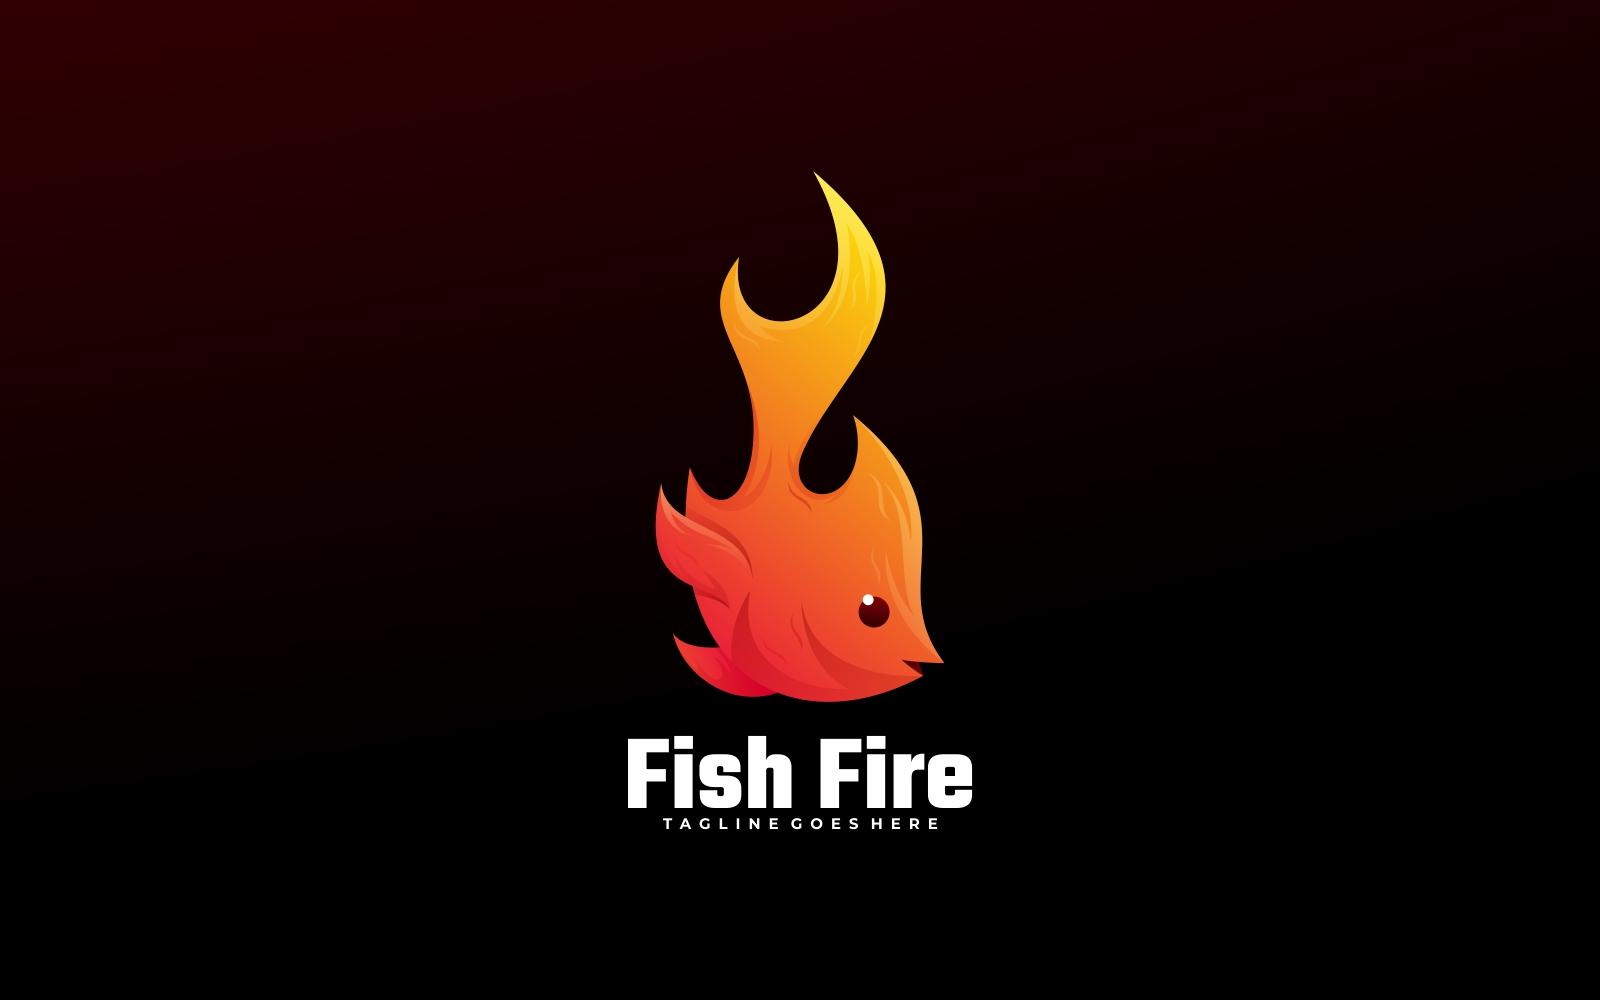 Fish Fire Gradient Logo Style - Shades of Orange